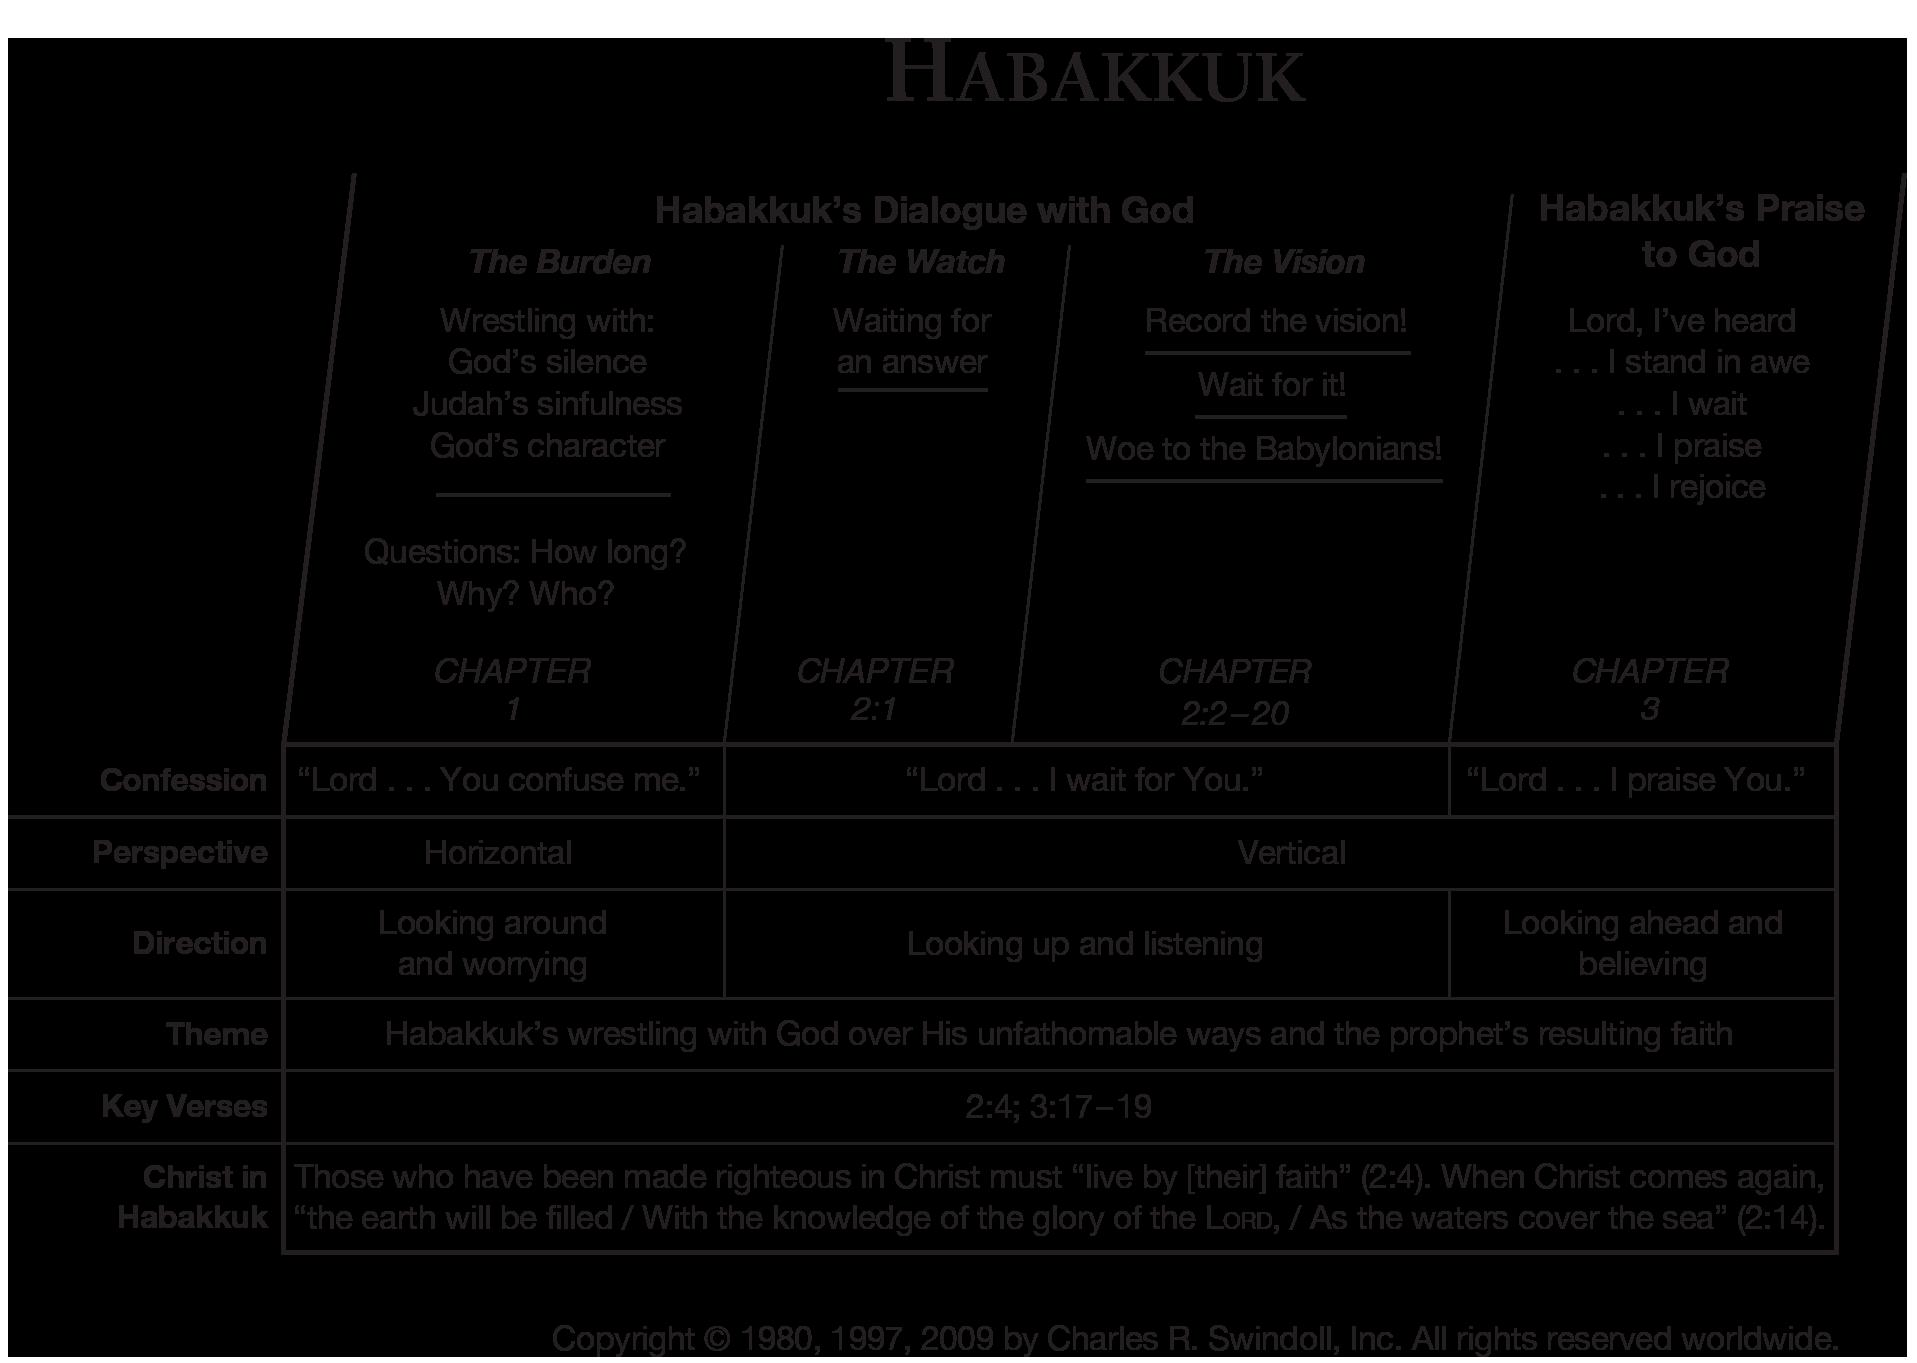 Book Of Habakkuk Overview